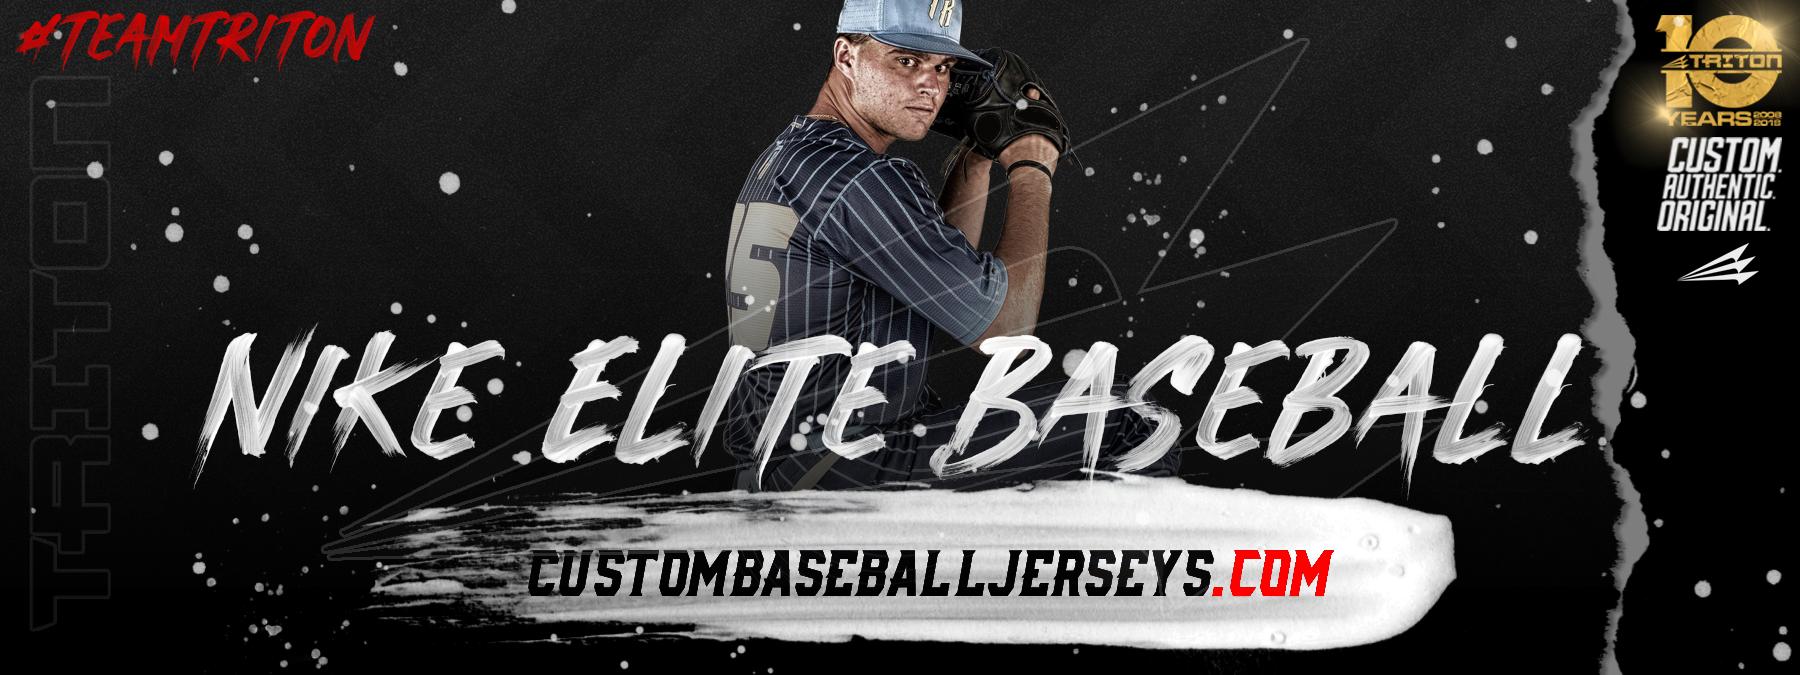 mago dos Amargura  Nike Elite Custom Traditional Baseball Jerseys - Custom Baseball Jerseys  .com - The World's #1 Choice for Custom Baseball Uniforms